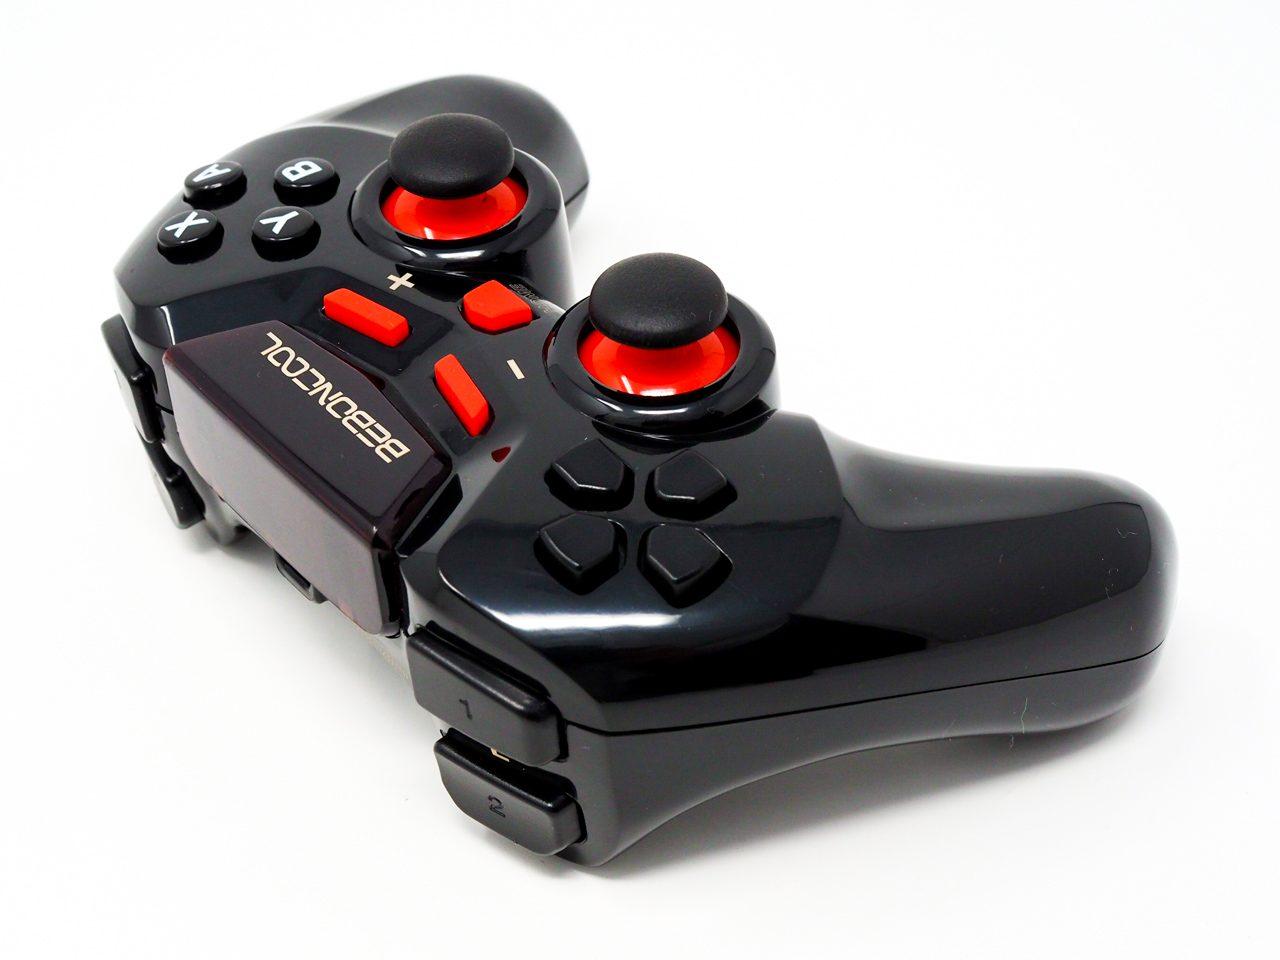 BEBONCOOLのNintendo Switch用コントローラー